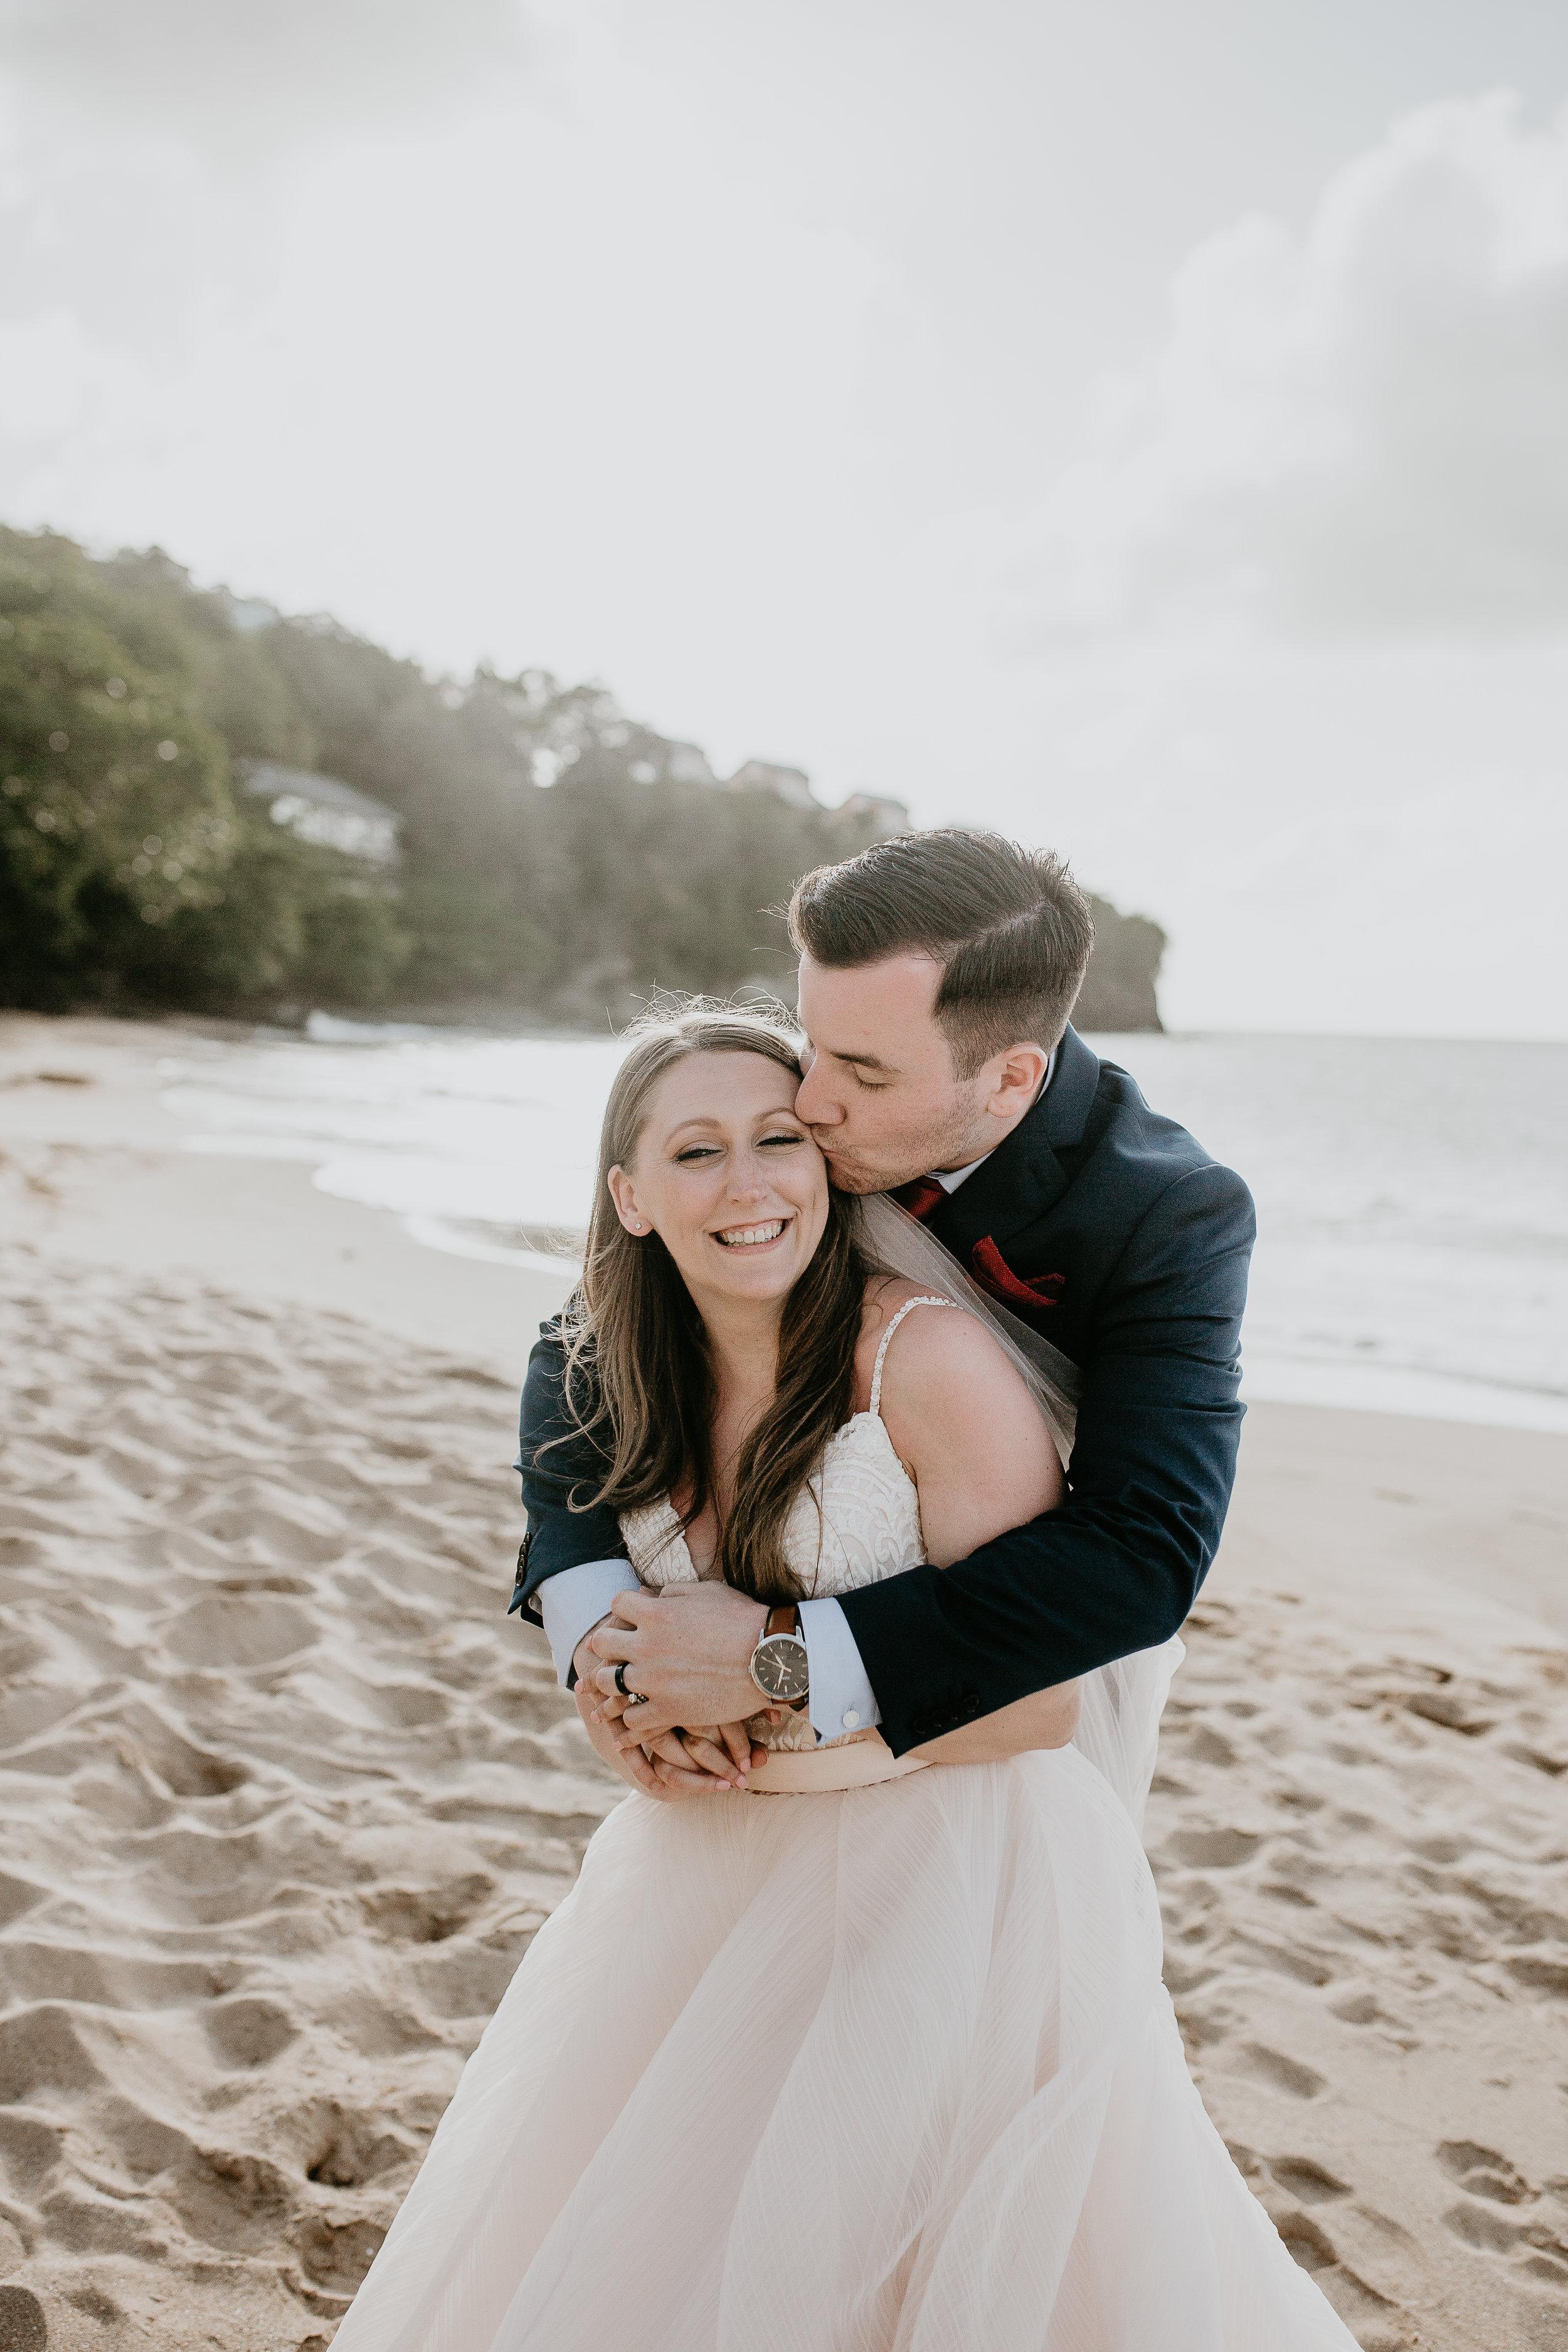 nicole-daacke-photography-destination-wedding-in-st-lucia-sandals-la-toc-intimate-island-wedding-carribean-elopement-photographer-chill-island-wedding-99.jpg